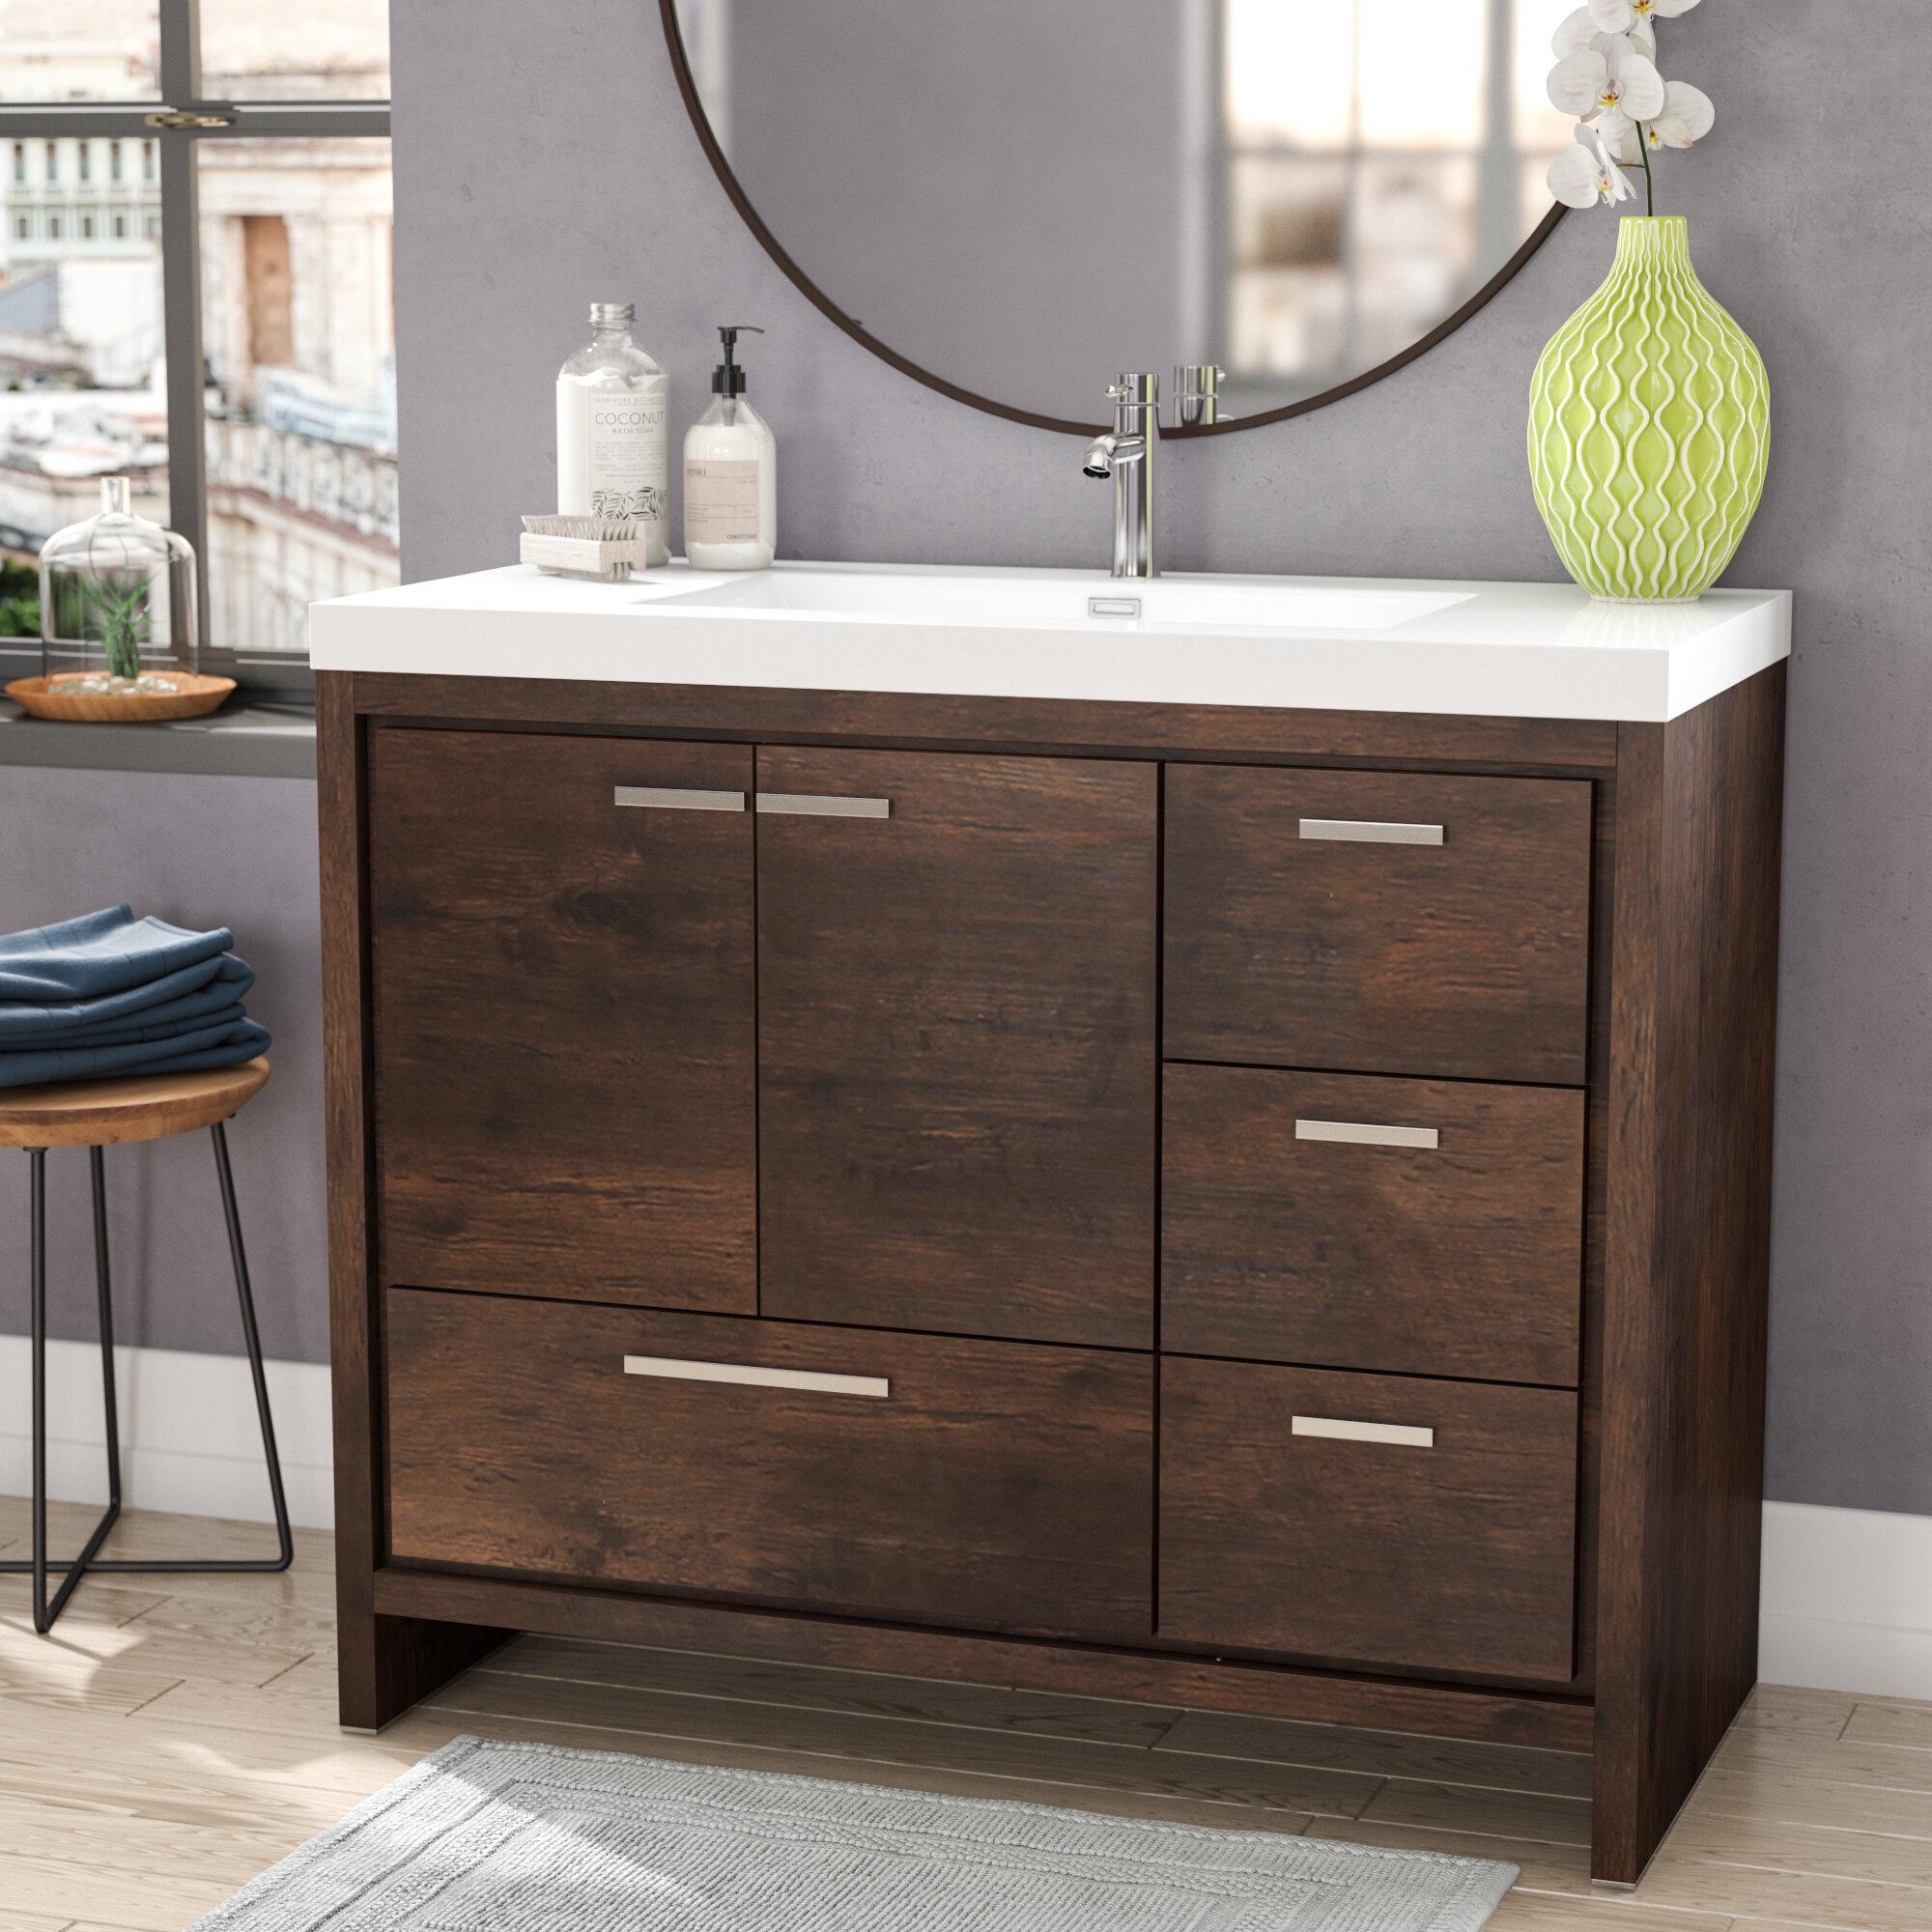 Ivy Bronx Harger Free Standing Modern 42 Rectangular Single Bathroom Vanity Set Reviews Wayfair